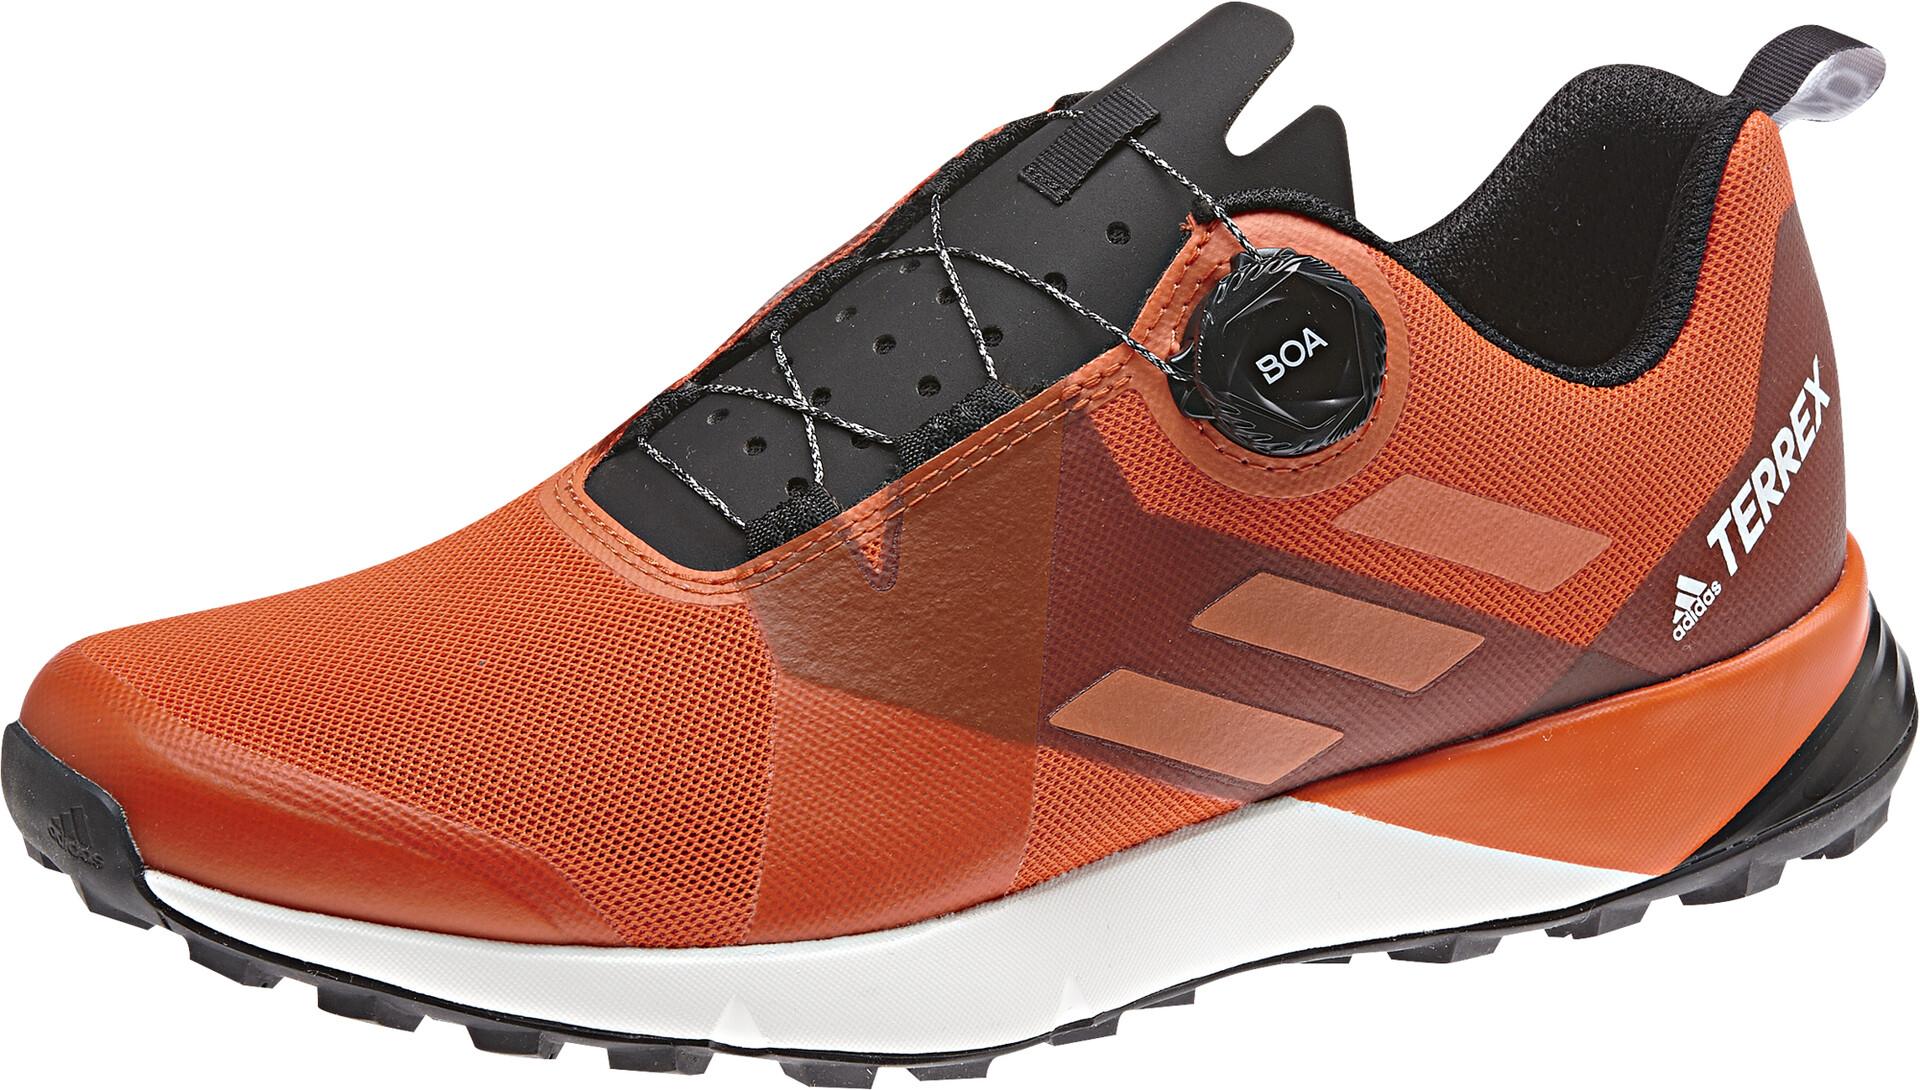 adidas TERREX Two Boa Chaussures Homme, active orangetruoracore black